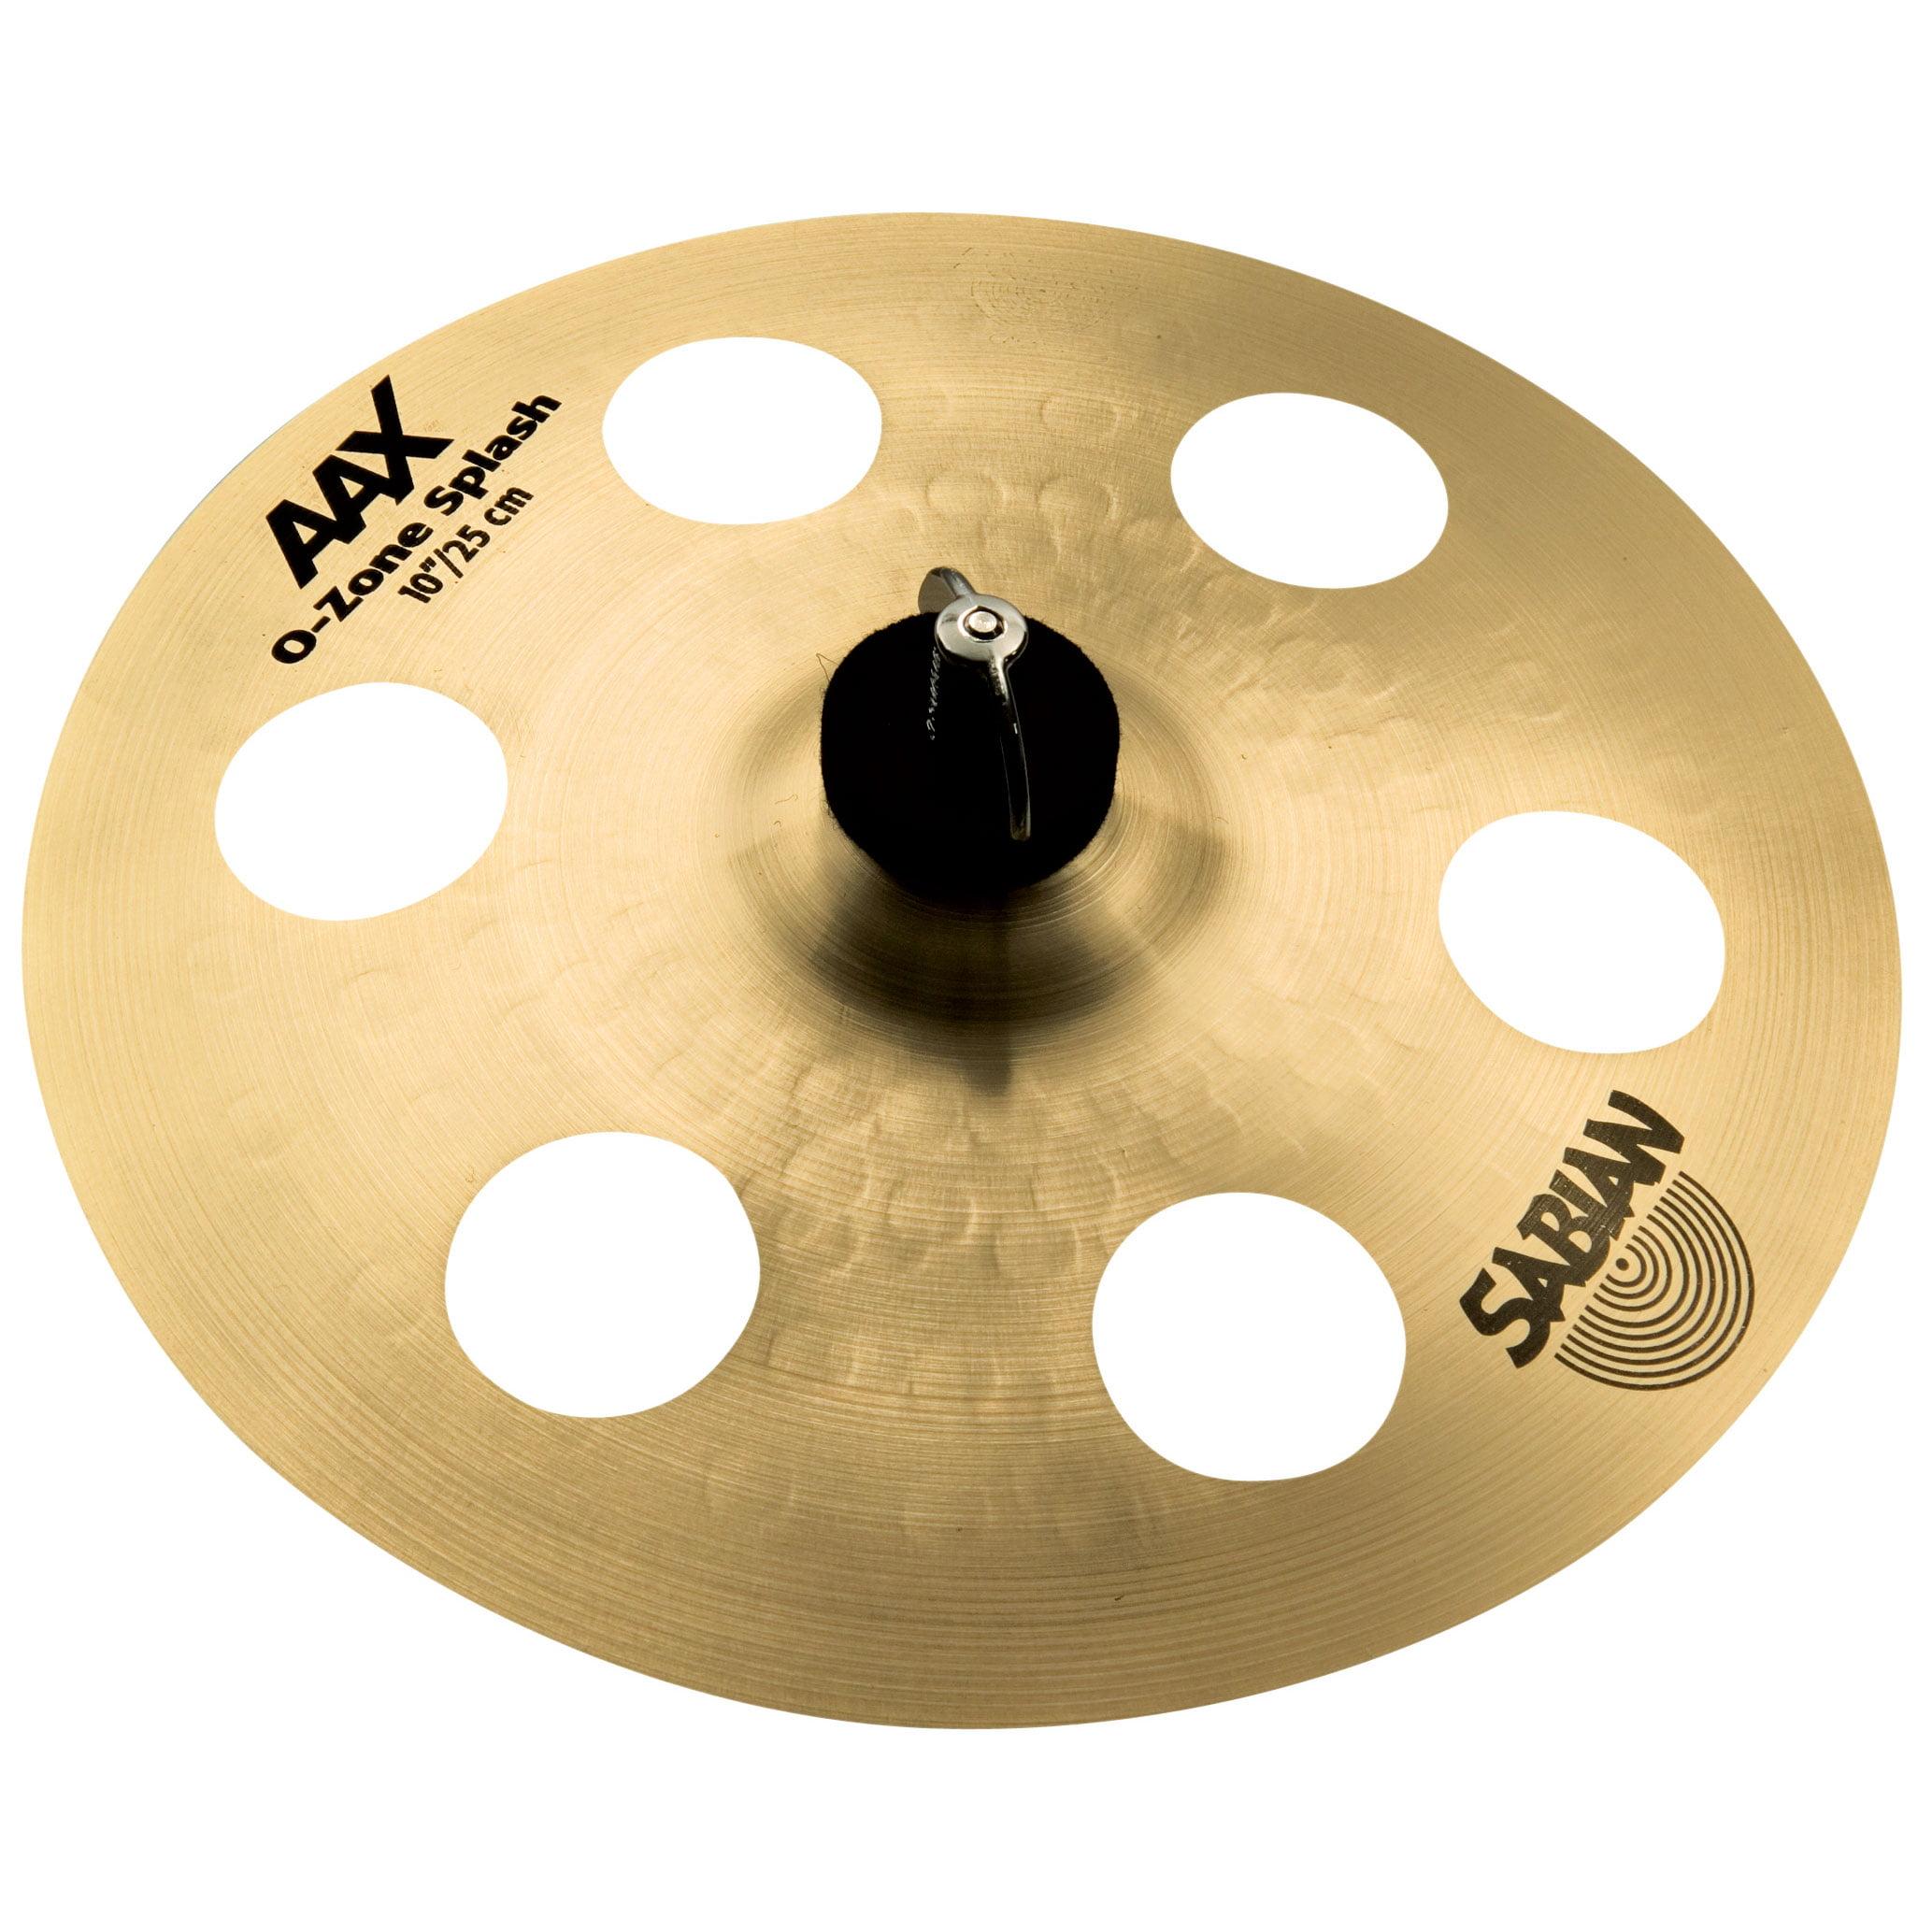 "Sabian 21000X AAX 10"" Ozone Splash Cymbal by Sabian"